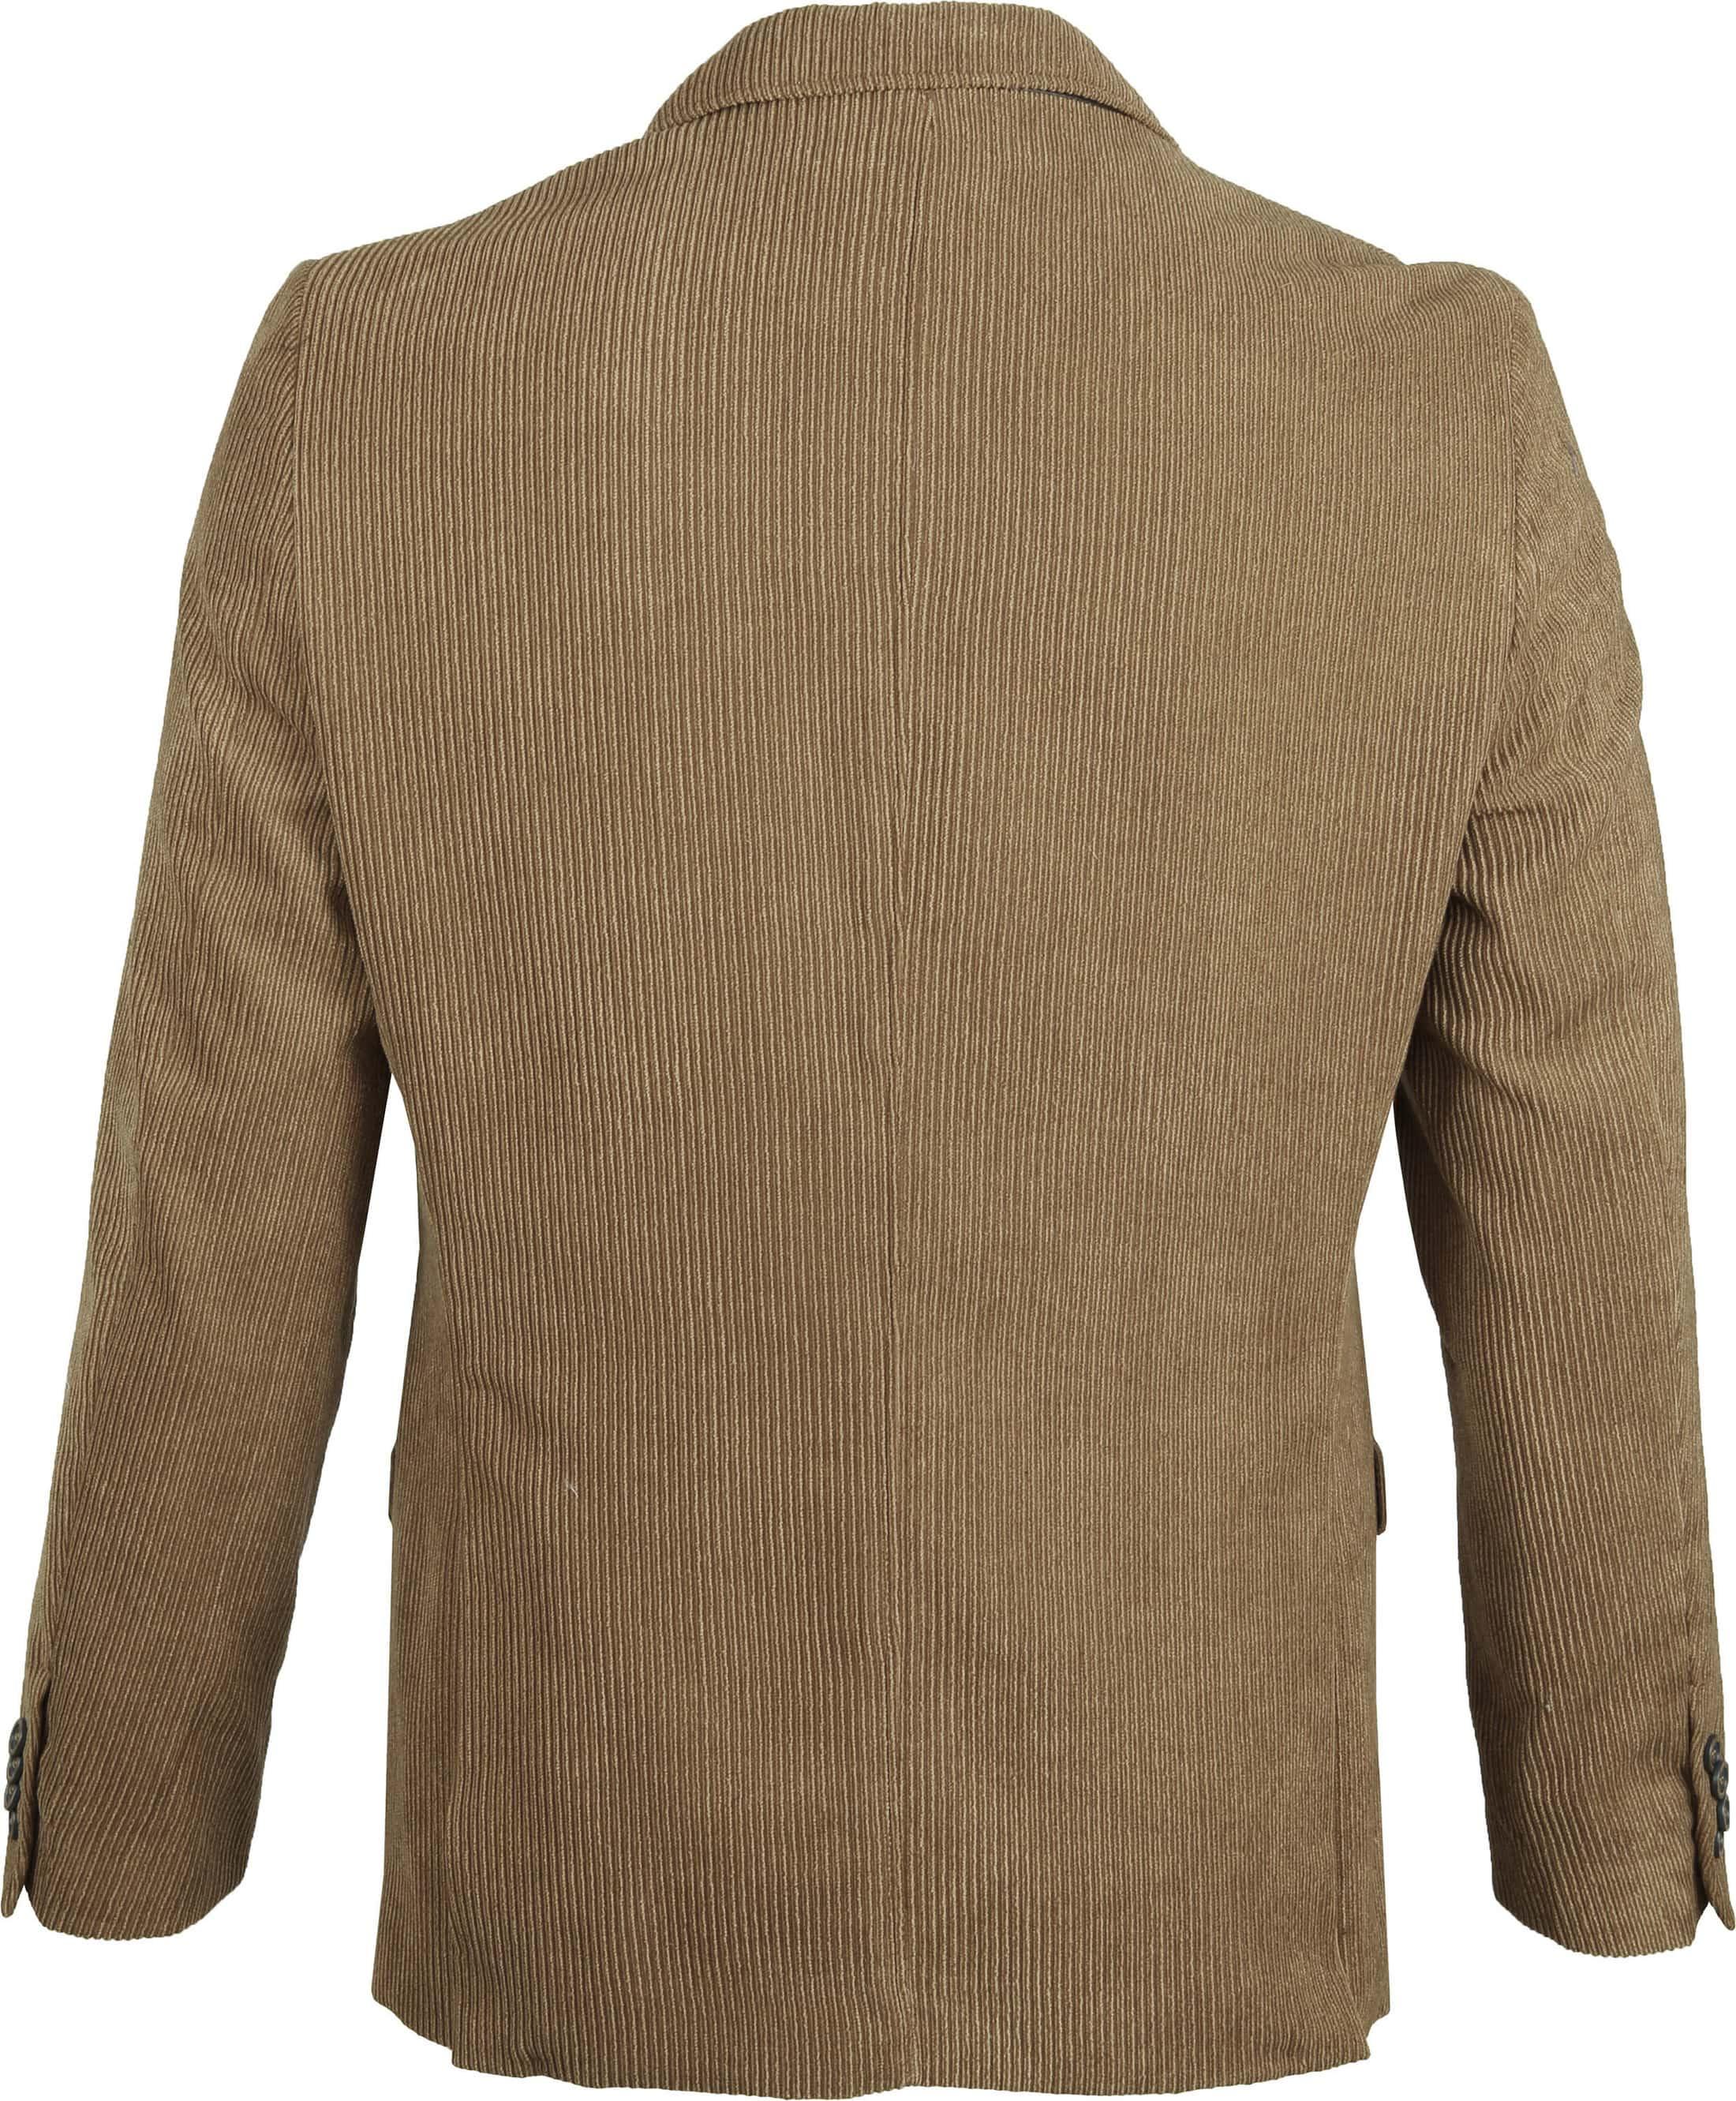 Suitable Tarm Blazer Corduroy Khaki Foto 4